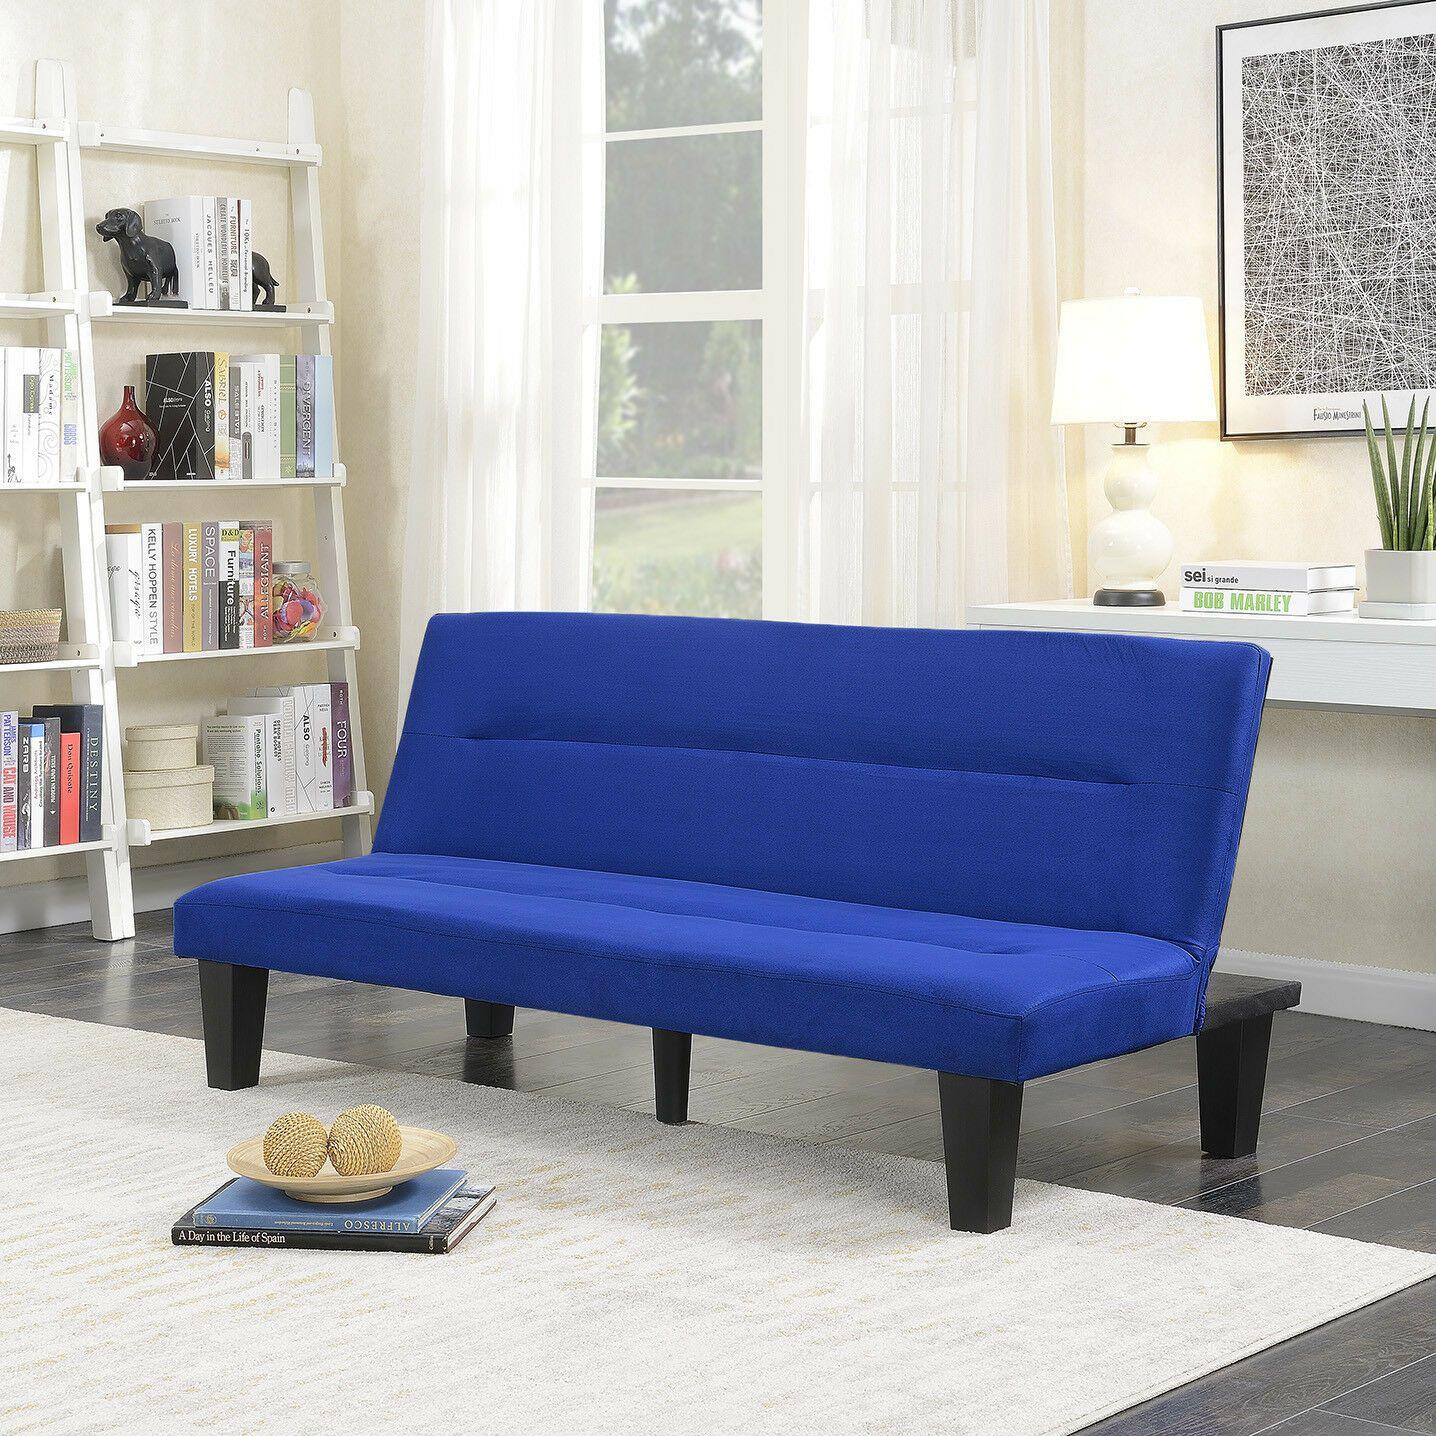 Microfiber Futon Folding Couch Sofa Bed Sleep Recliner